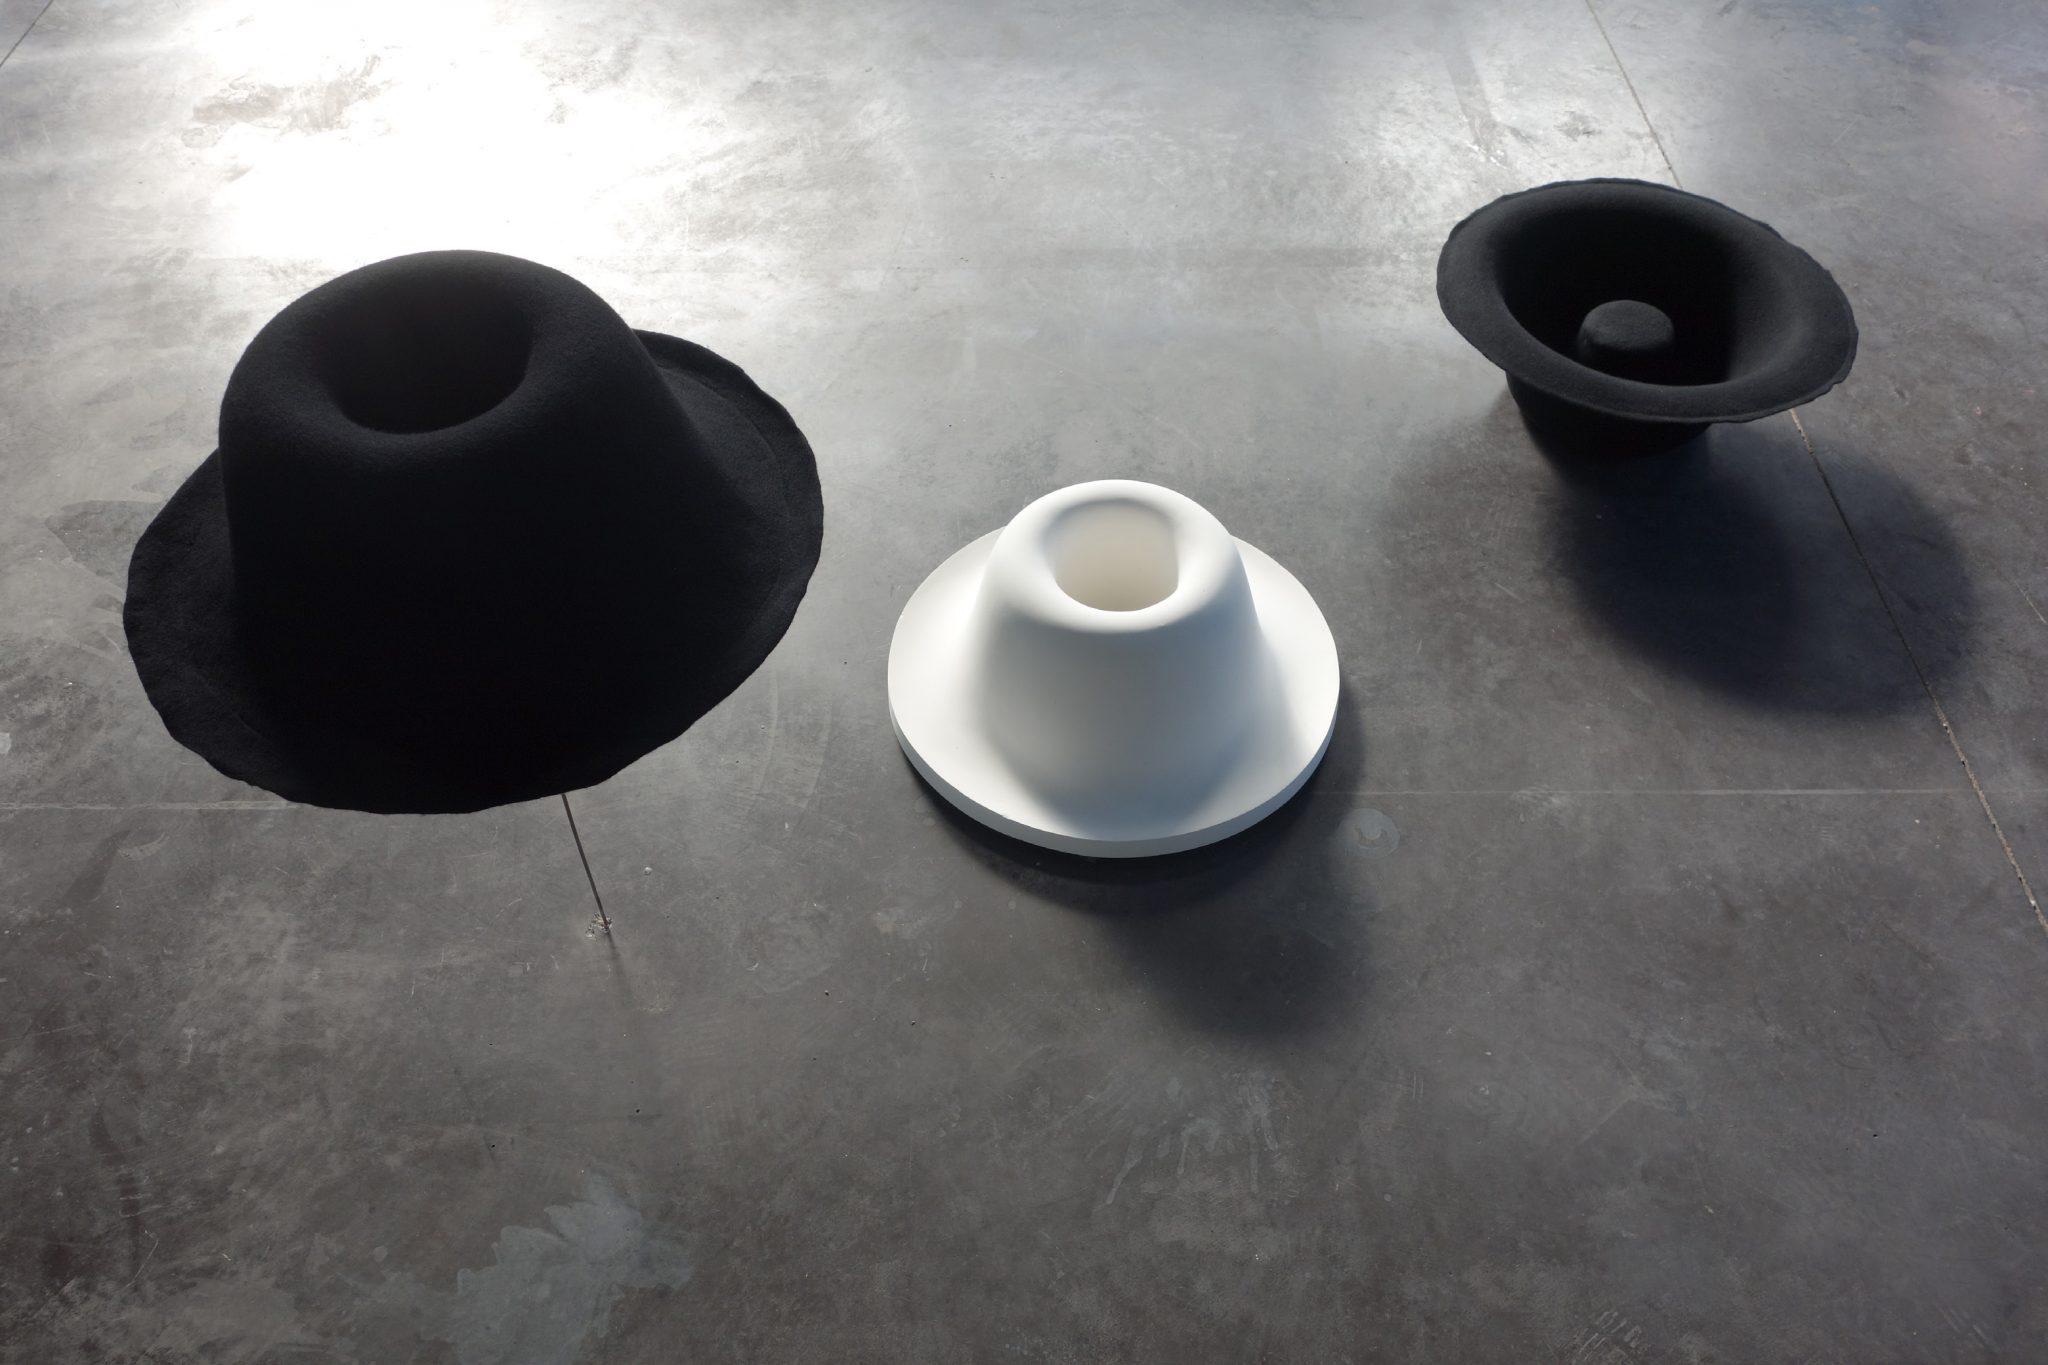 Wheels within wheels, une affaire compliquée, détail, installation ©Mahalia Köhnke-Jehl